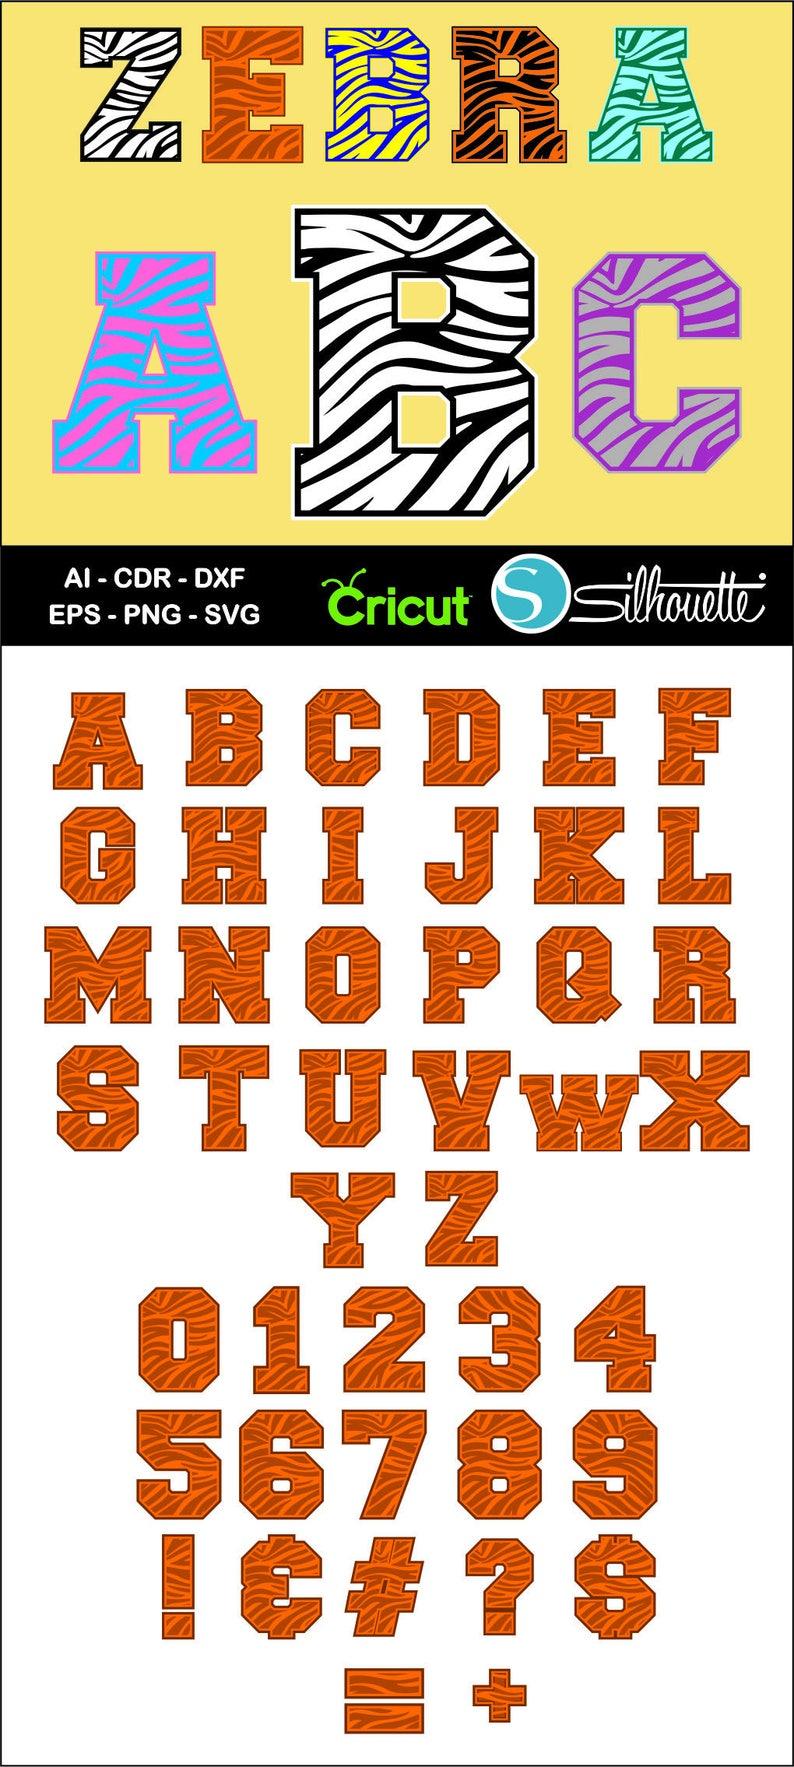 Buy 2 get 1 free, Zebra Alphabet font, Ai, CDR, Eps, SVG, Dxf, Png, Zebra  Letters, Zebra svg, Cricut, Silhouette Studio, Zebra font svg